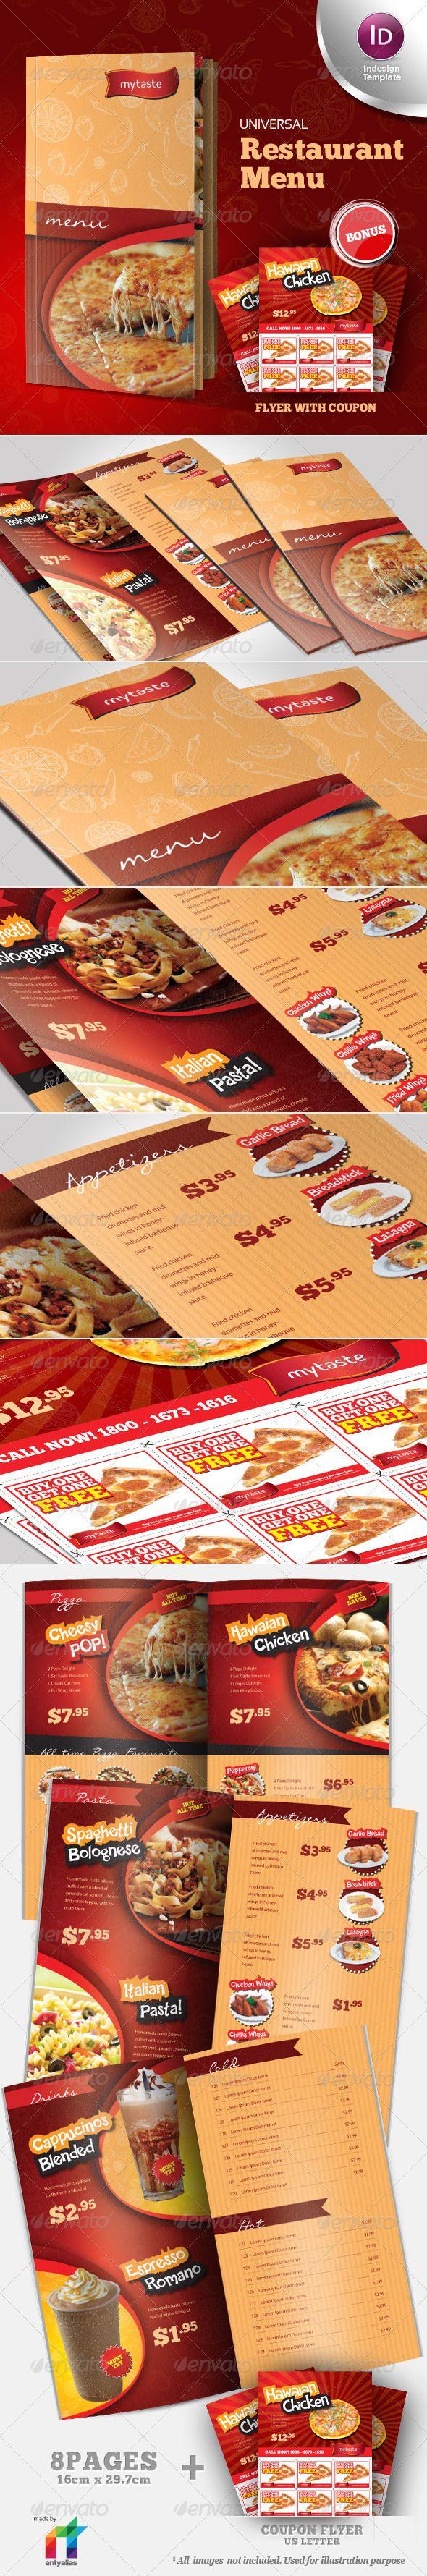 Universal Restaurant Menu Indesign Template Pizza fast food hamburguesería flyer menú carta restaurante